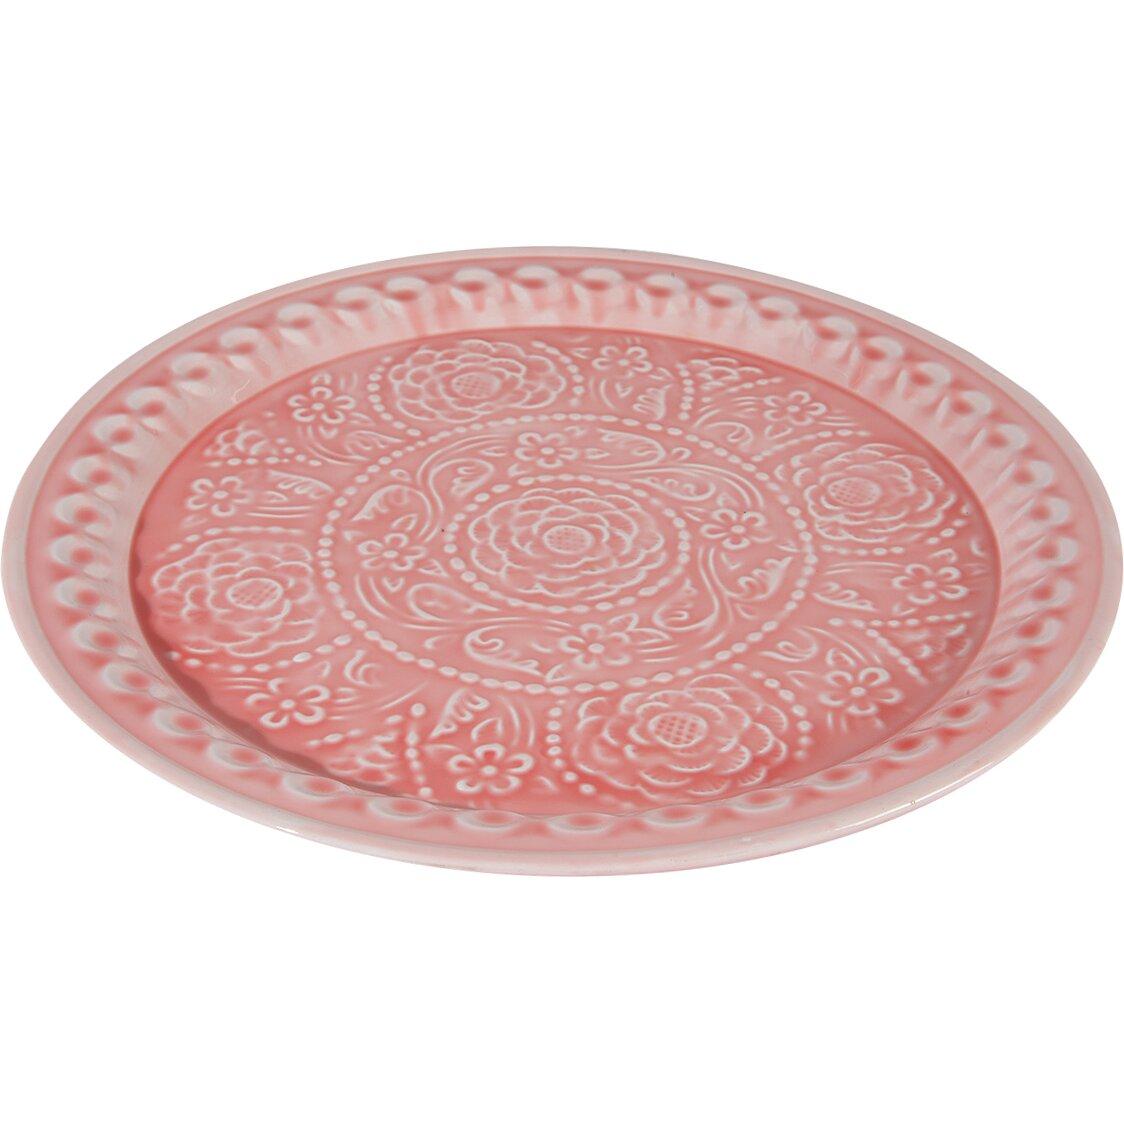 l 39 eau de fleur embossed rose floral decorative plate. Black Bedroom Furniture Sets. Home Design Ideas